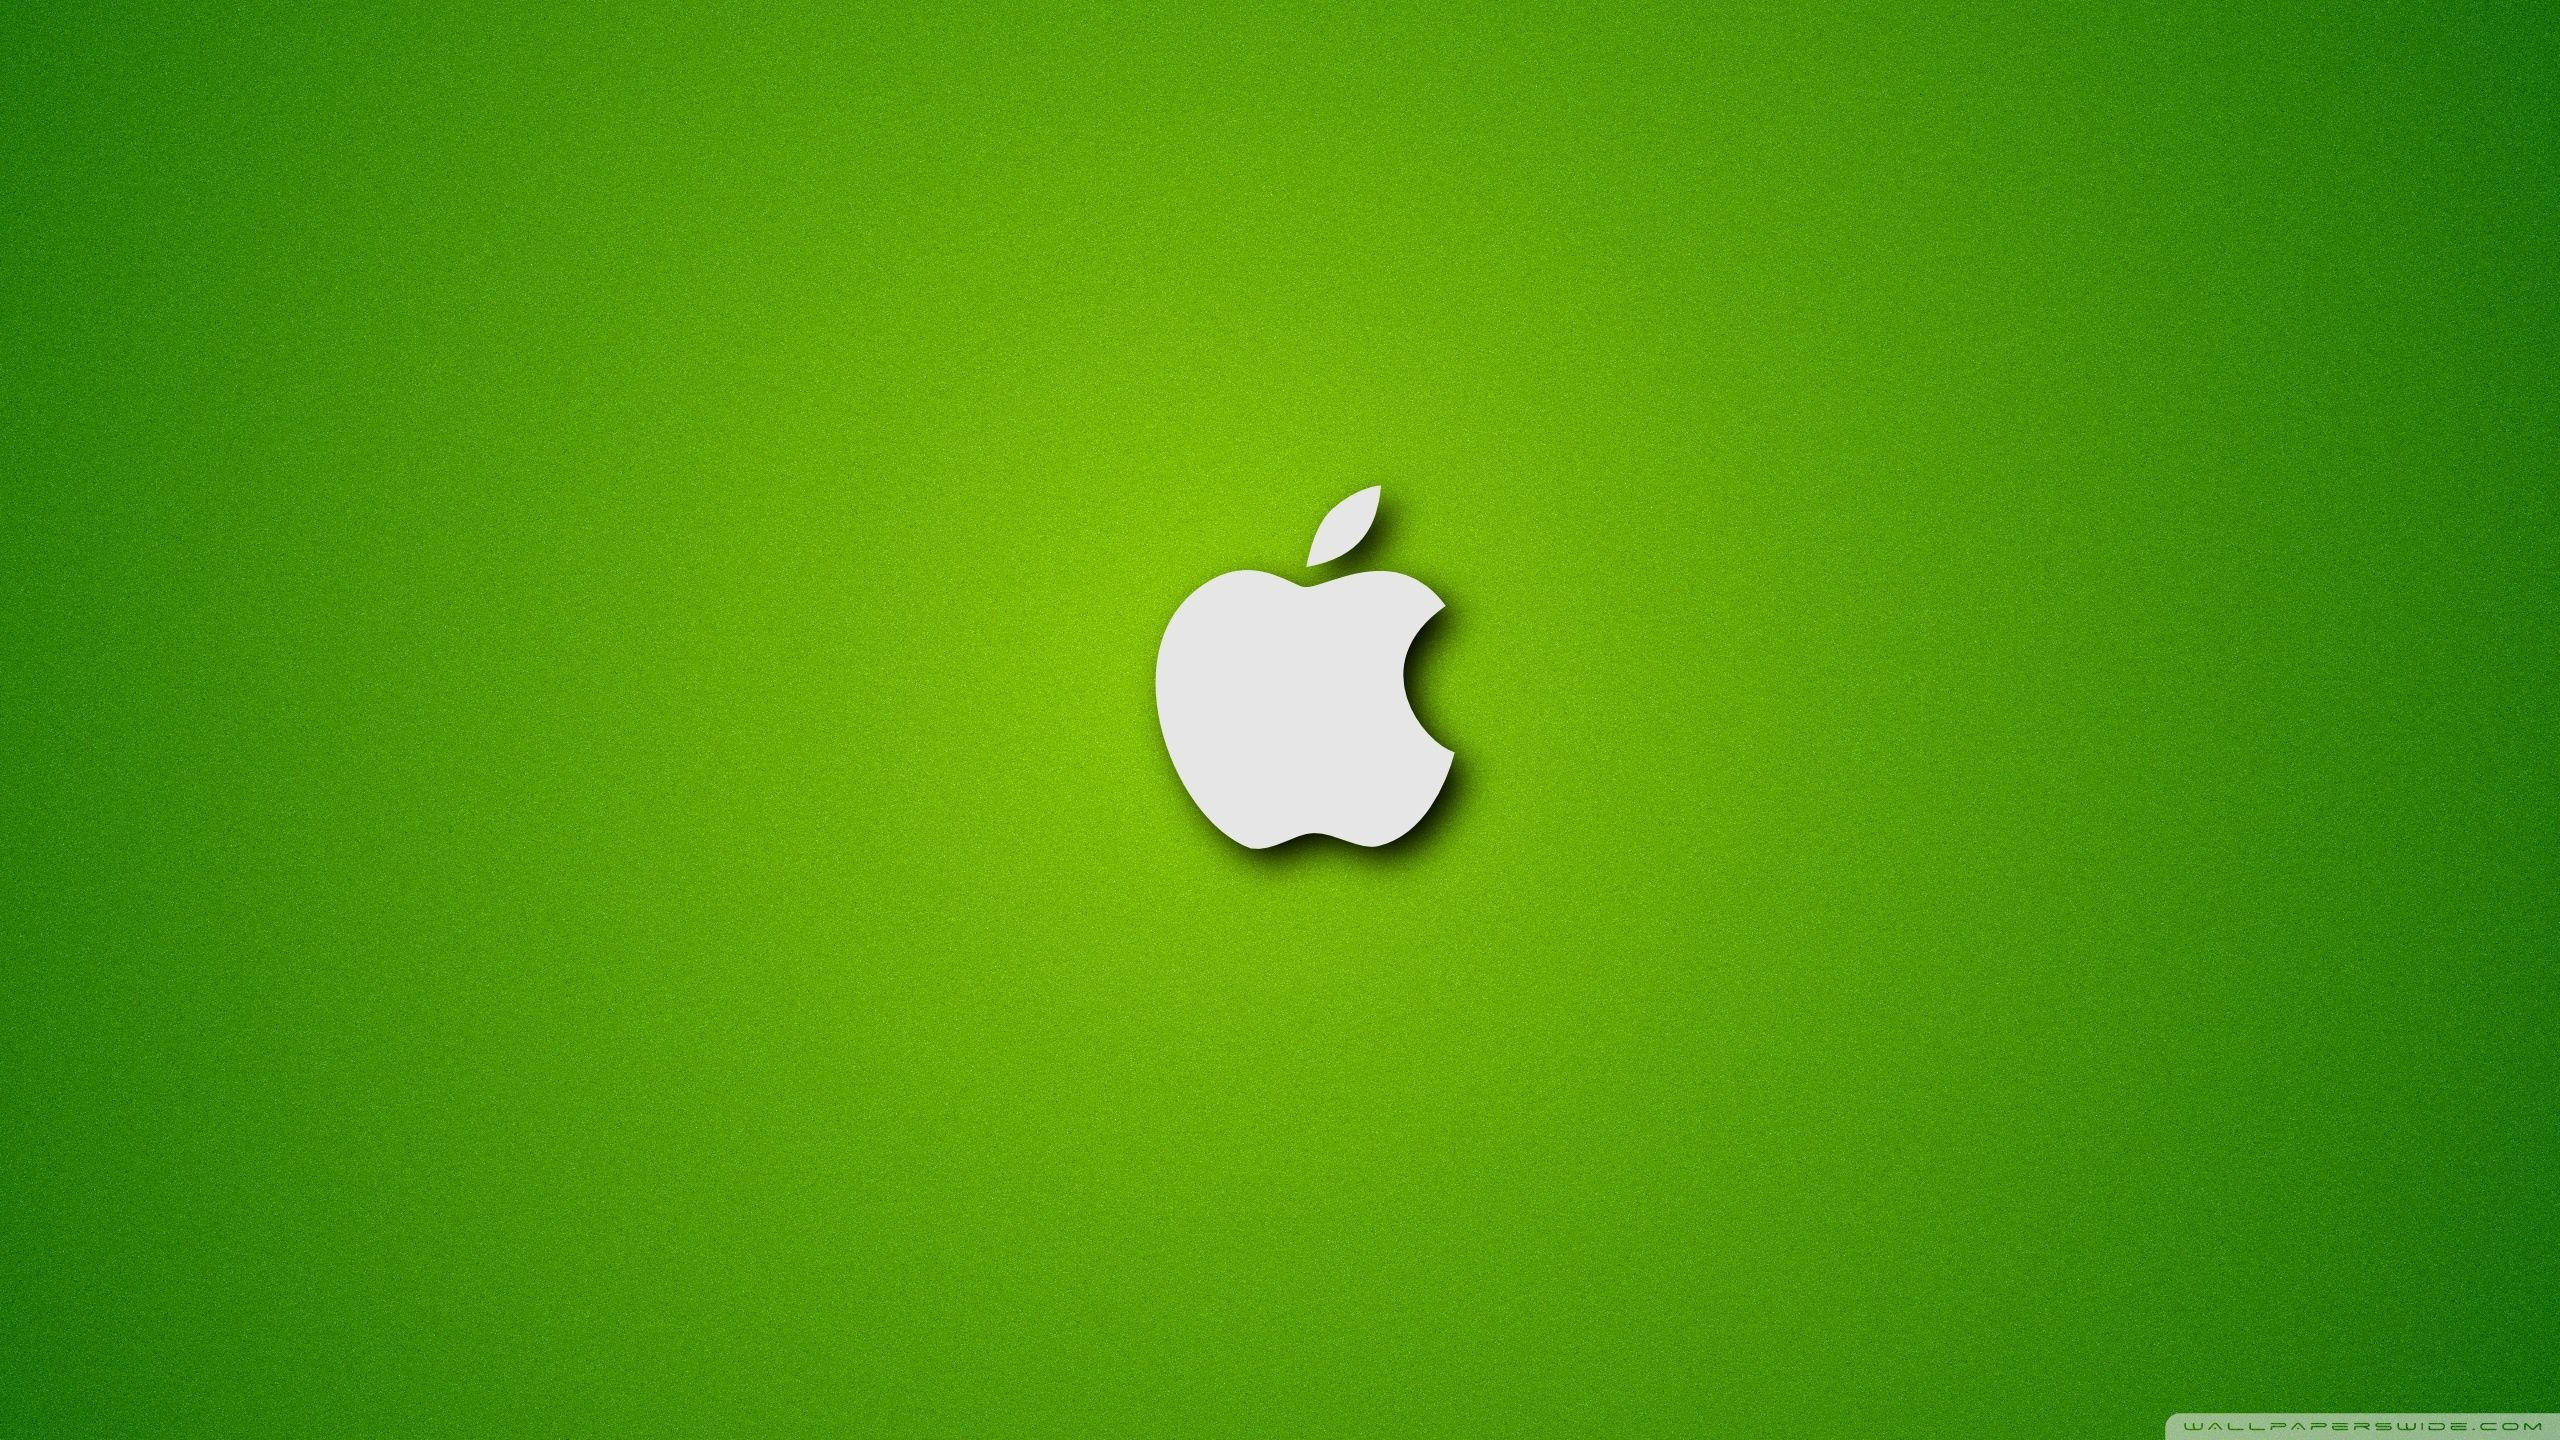 Green Apple Logo Wallpapers Top Free Green Apple Logo